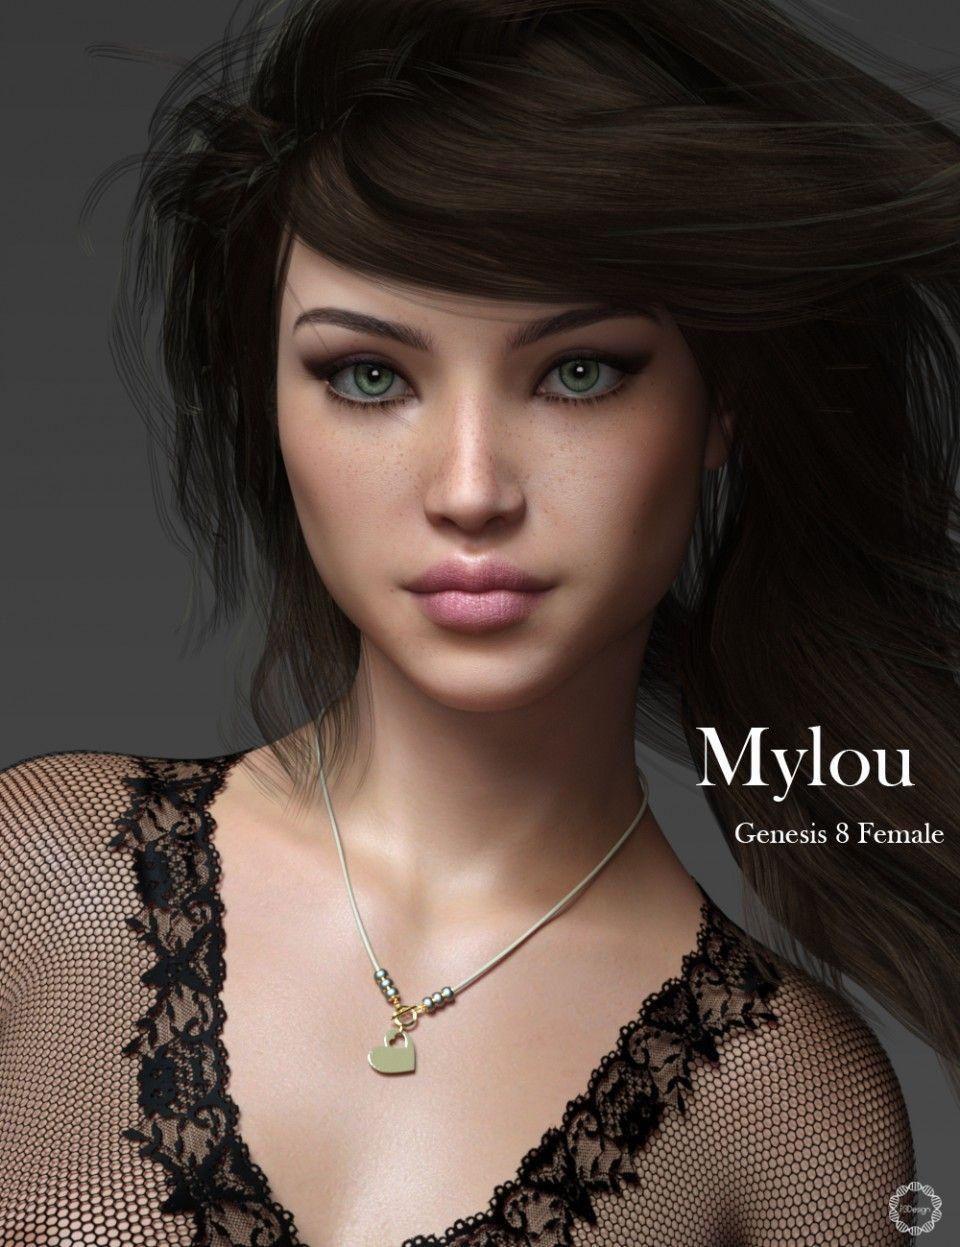 P3D Mylou for Genesis 8 Female | Daz Poser | Model, 3d